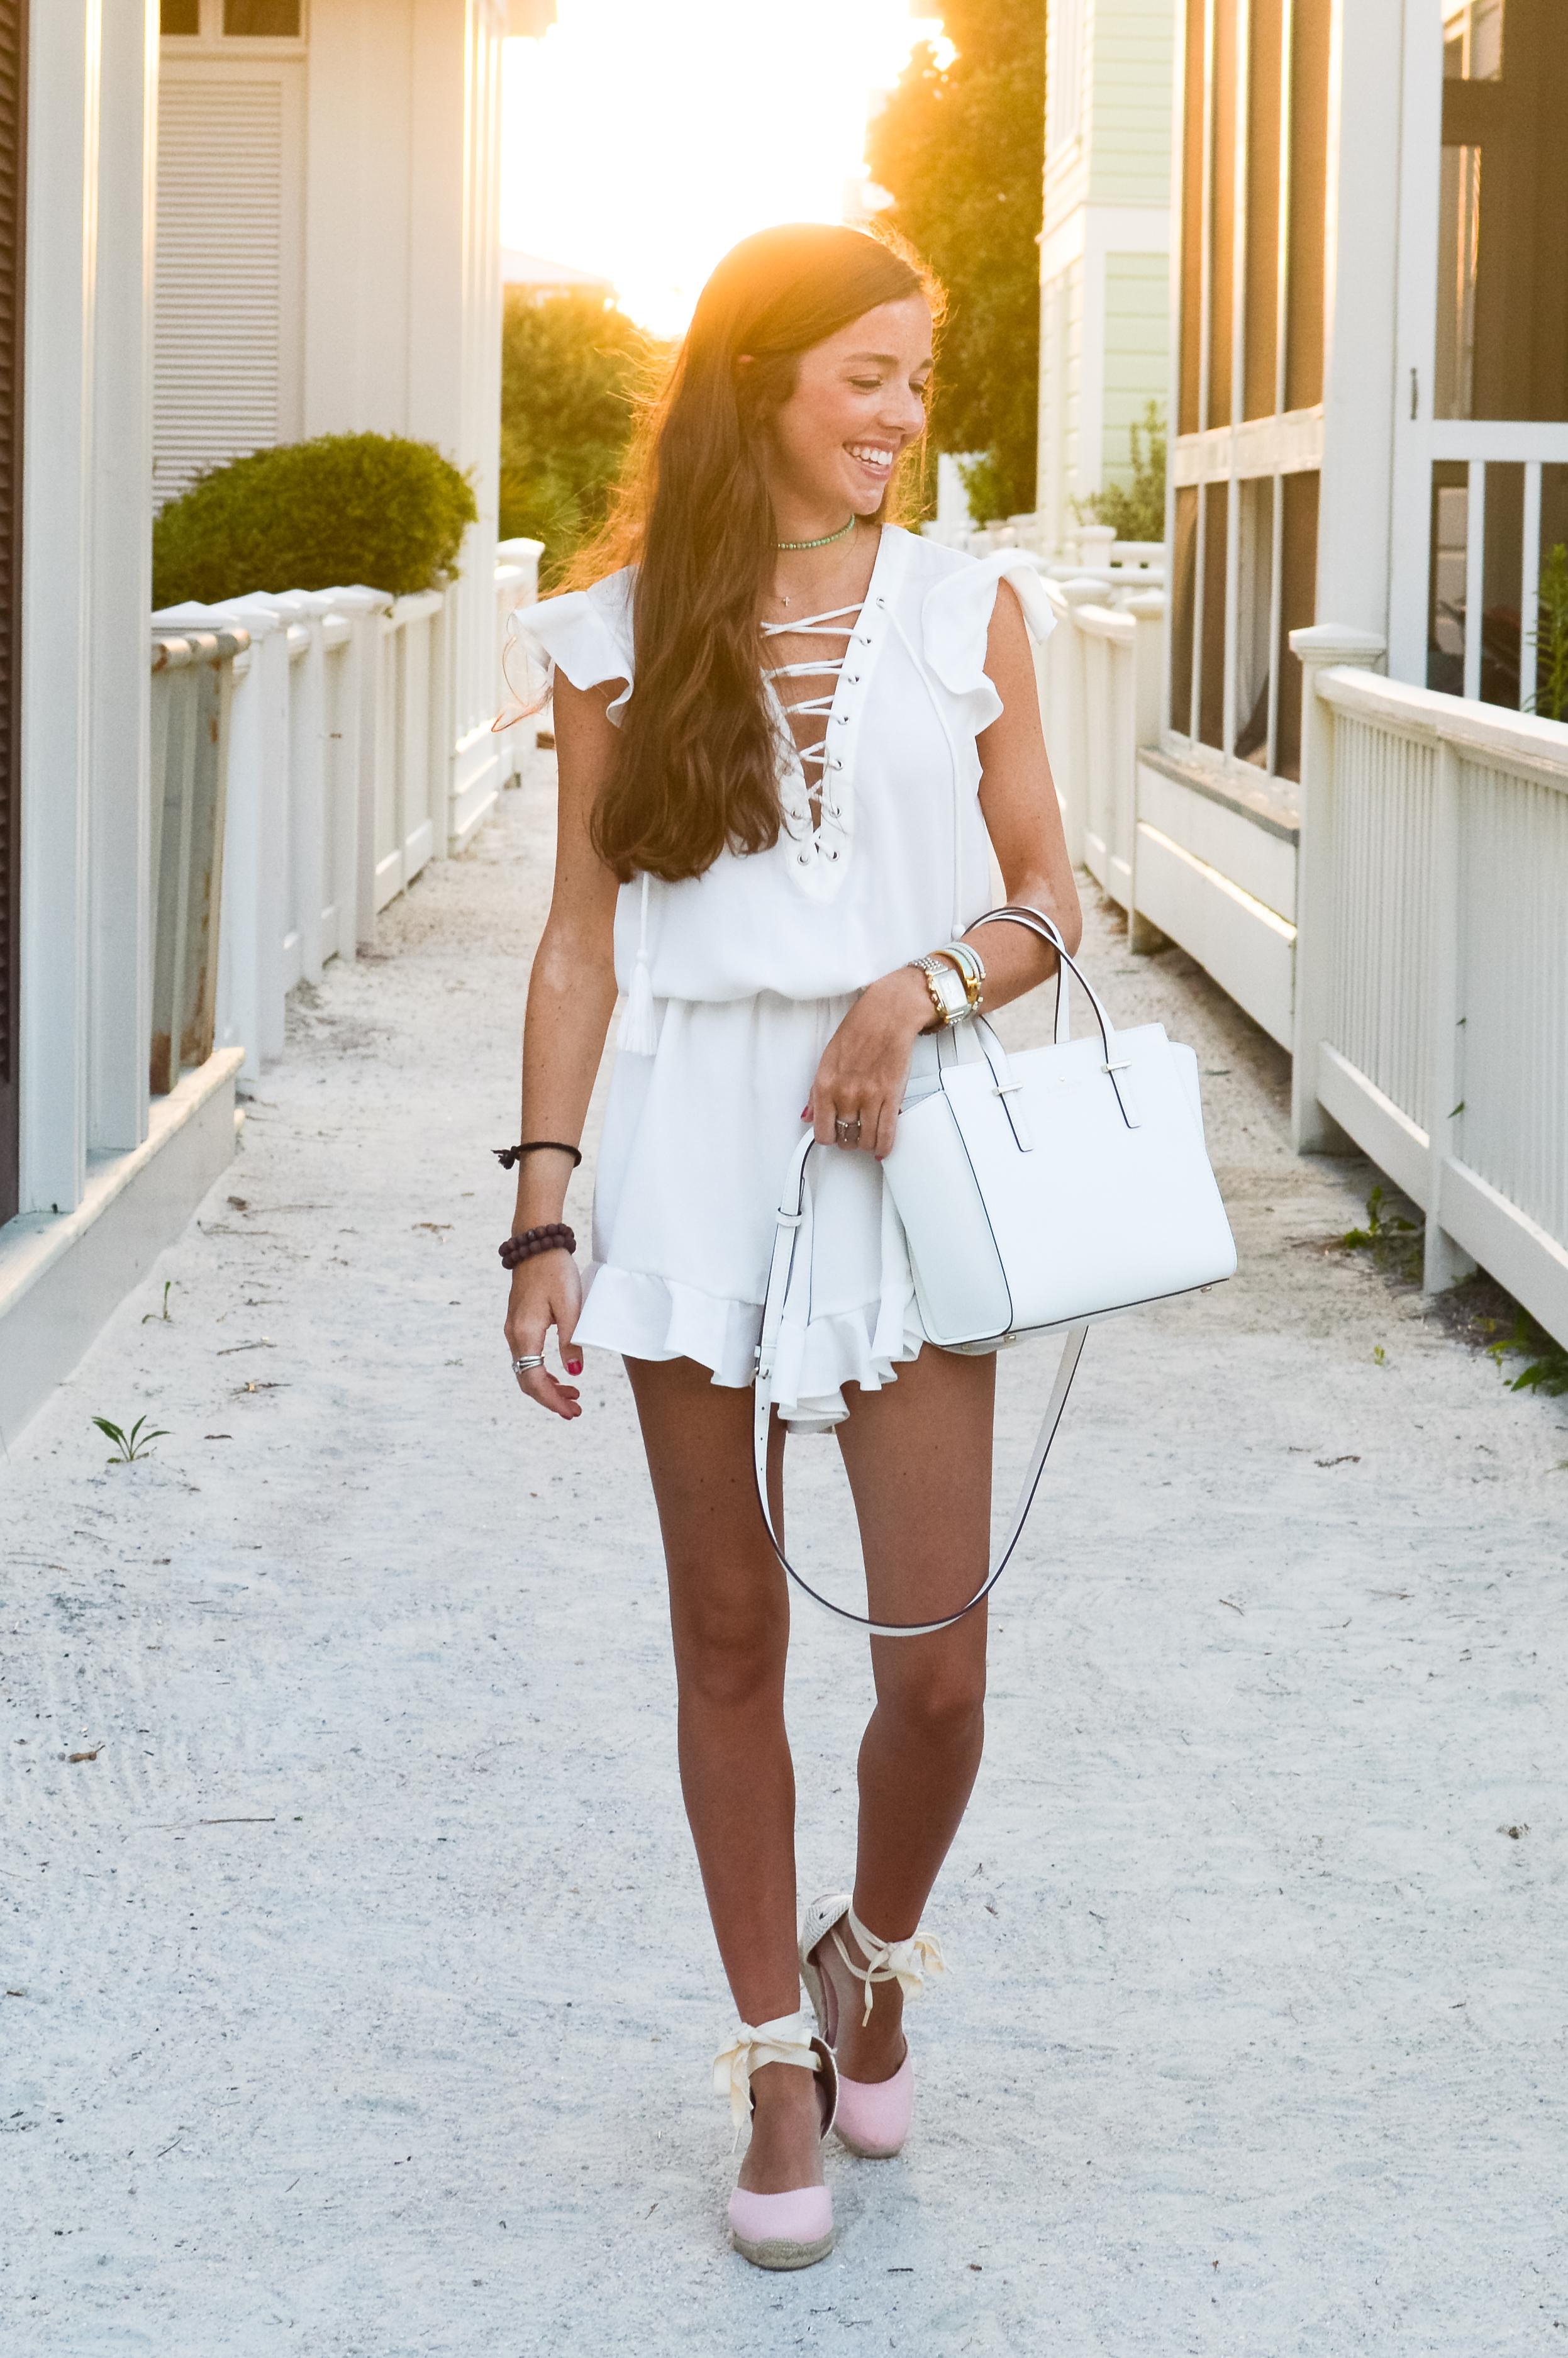 lcb_style_fashion_blogger_whiteromper (13 of 37).jpg